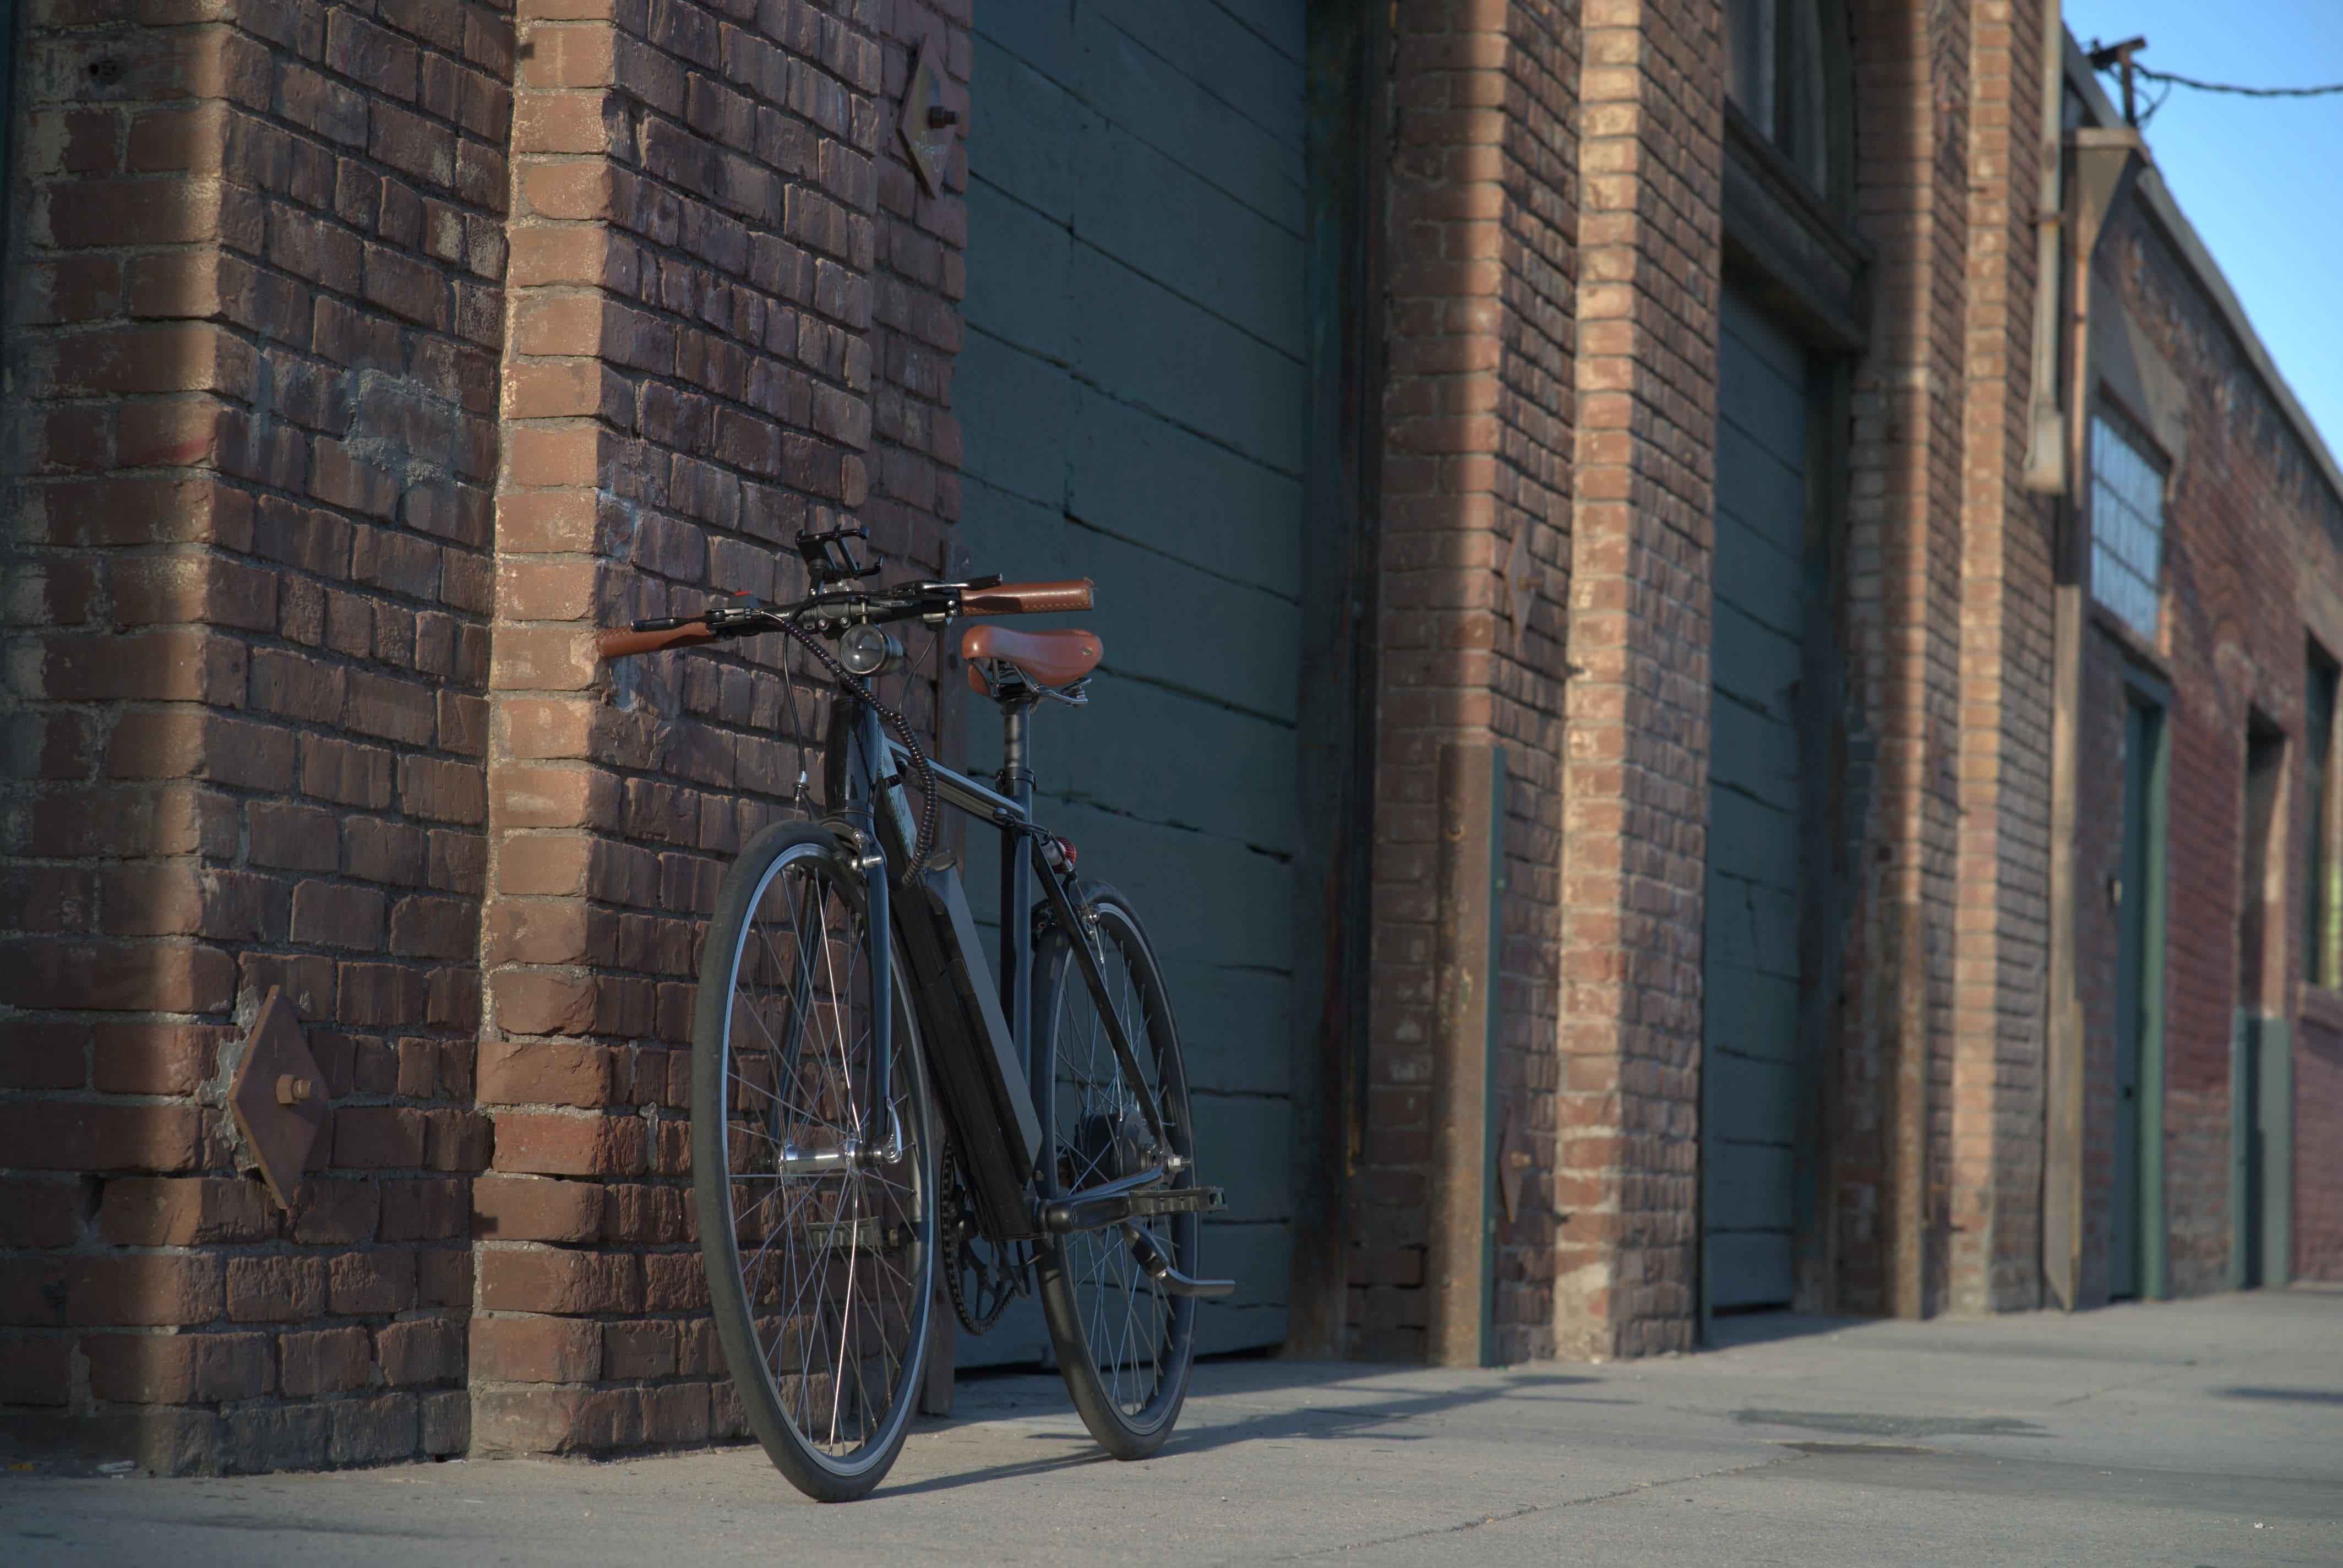 Calibike 33c3: A state-of-the-art ebike (fastest electric bi